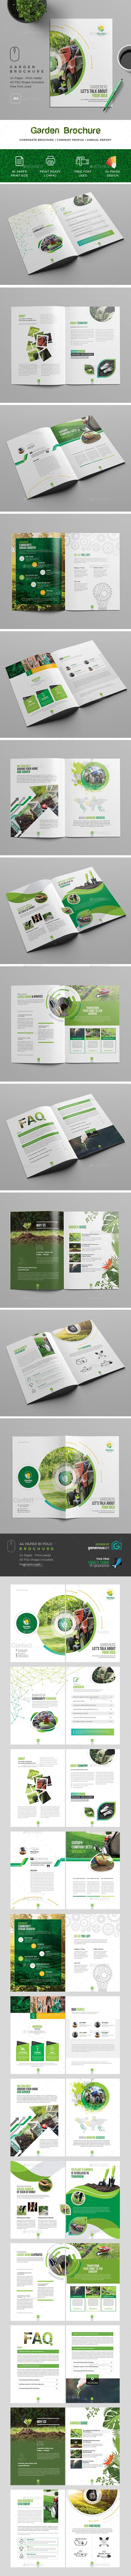 Garden Brochure Template 24 Page - Brochures Print Templates